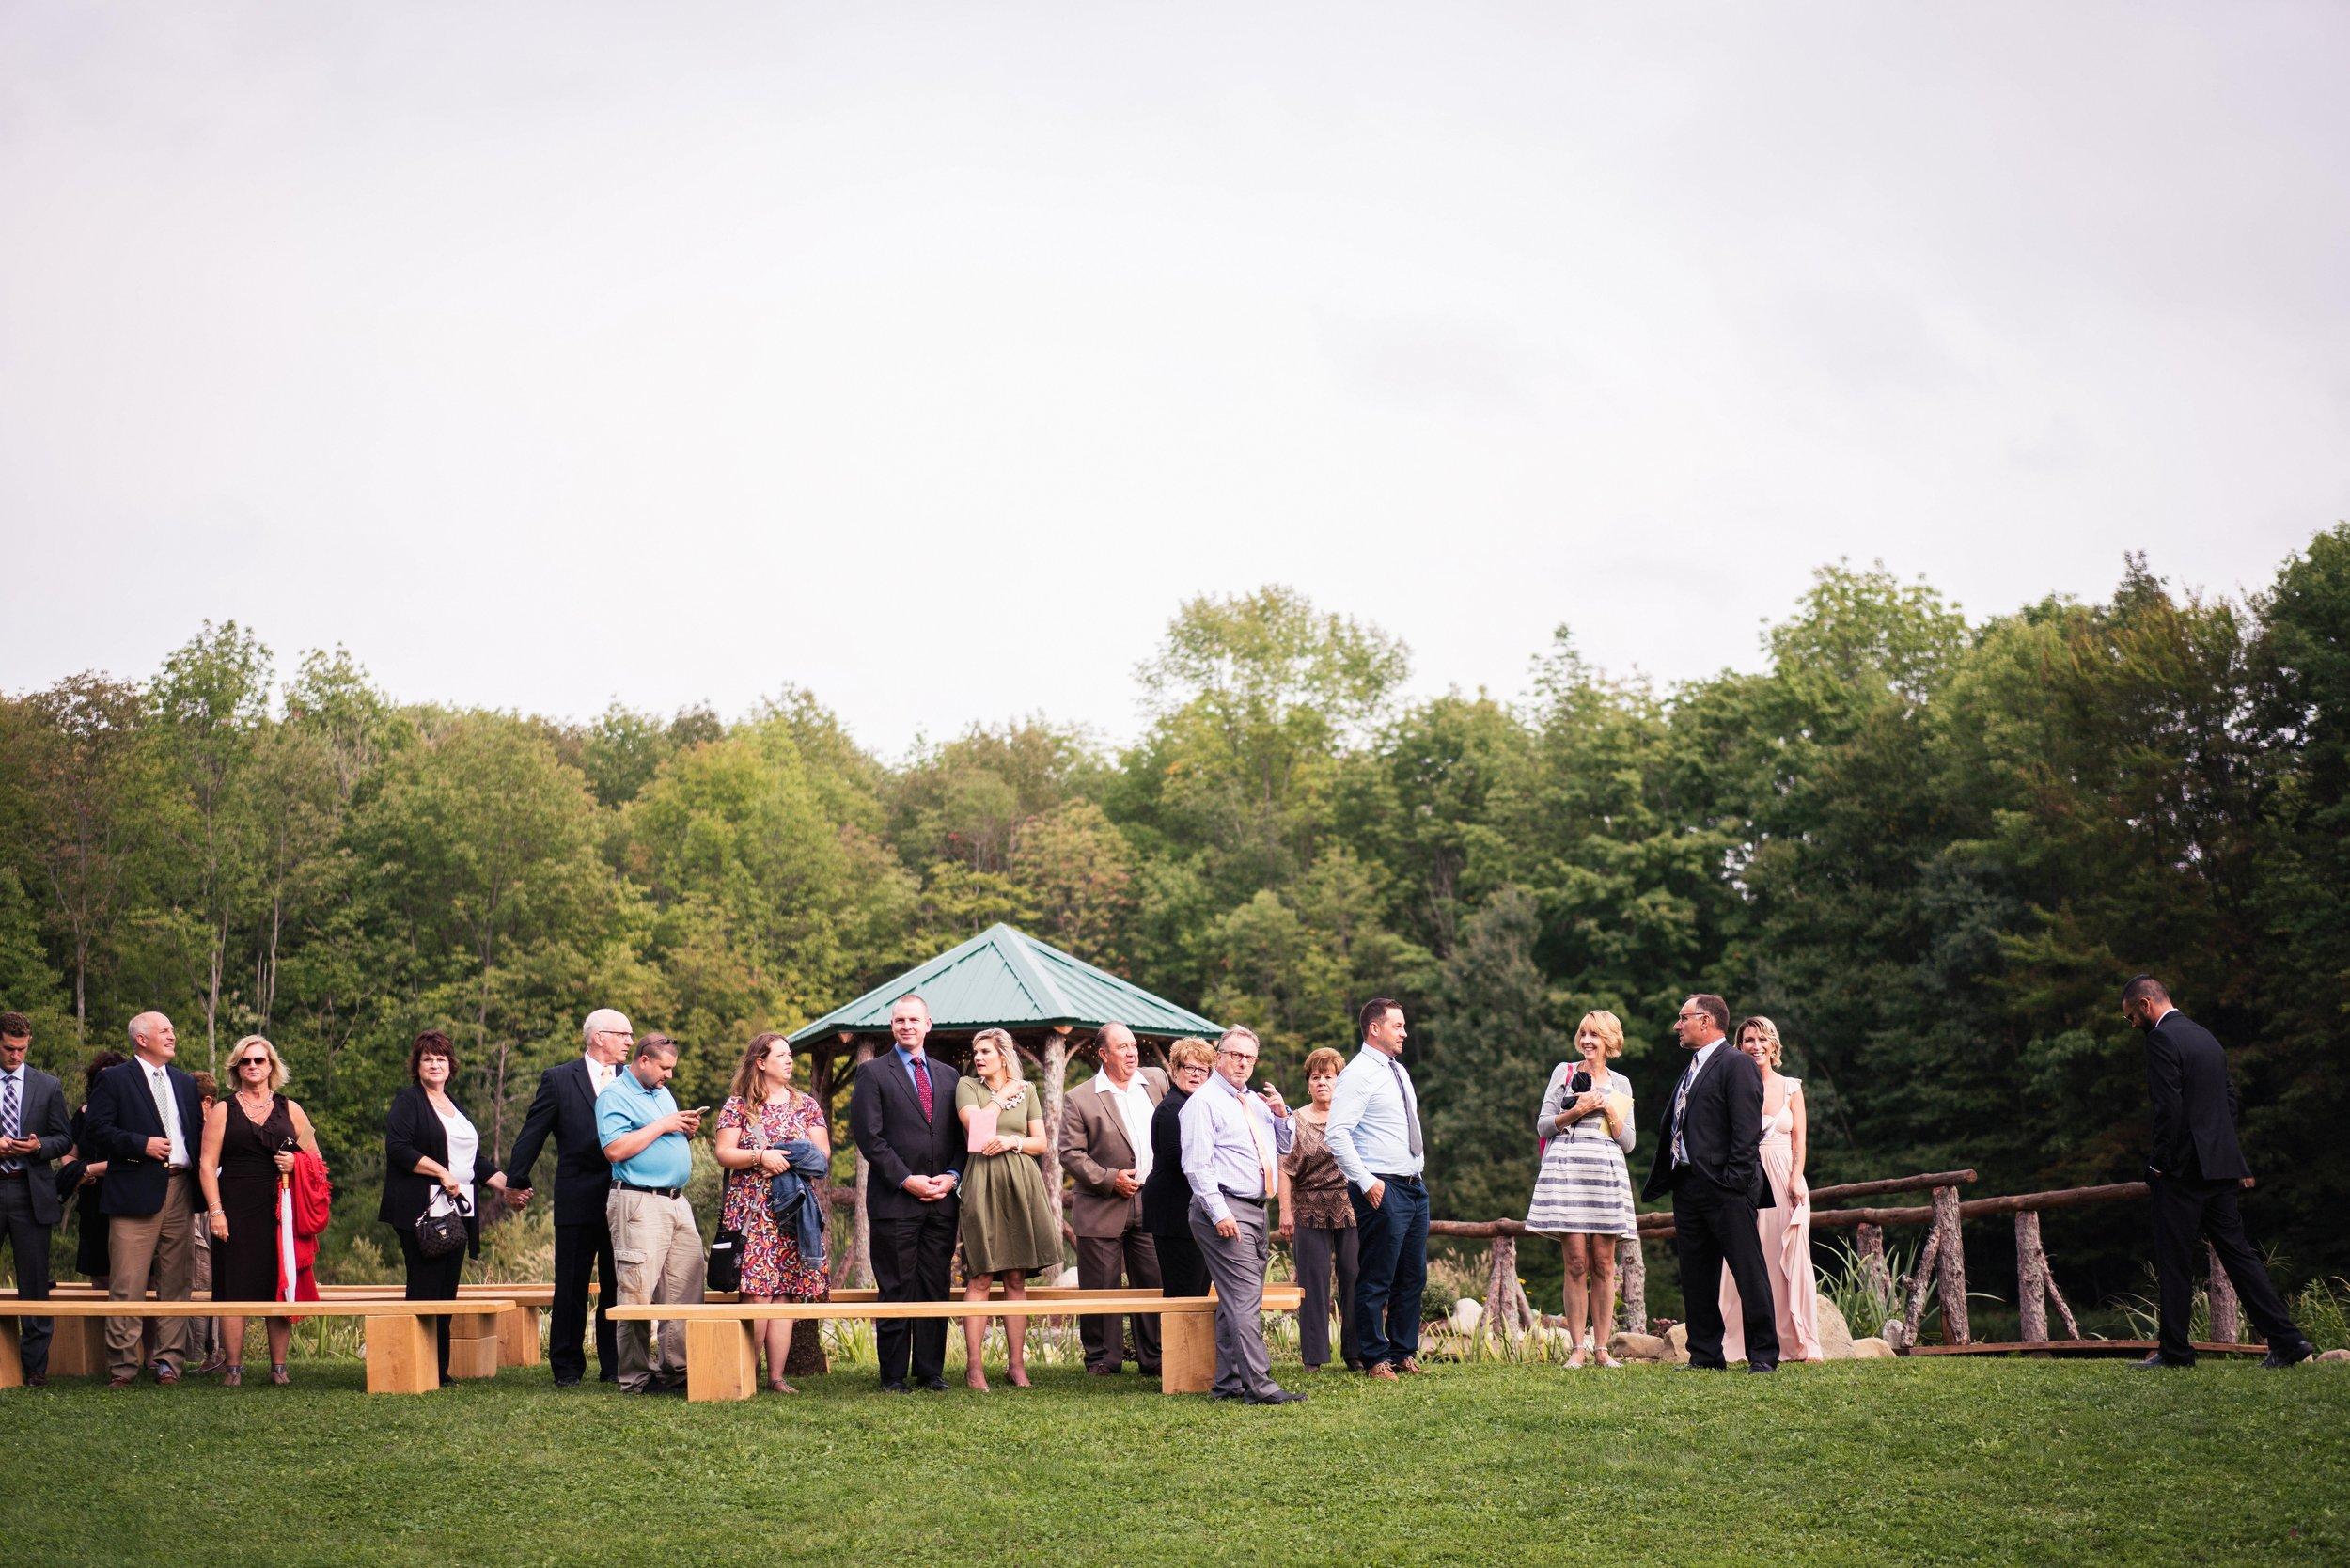 Blog-Lisa-James-Wedding-at Rosebud Estate Weddings in Arcade NY by Stefan-Ludwig-Photography-Buffalo-NY-52-x.jpg